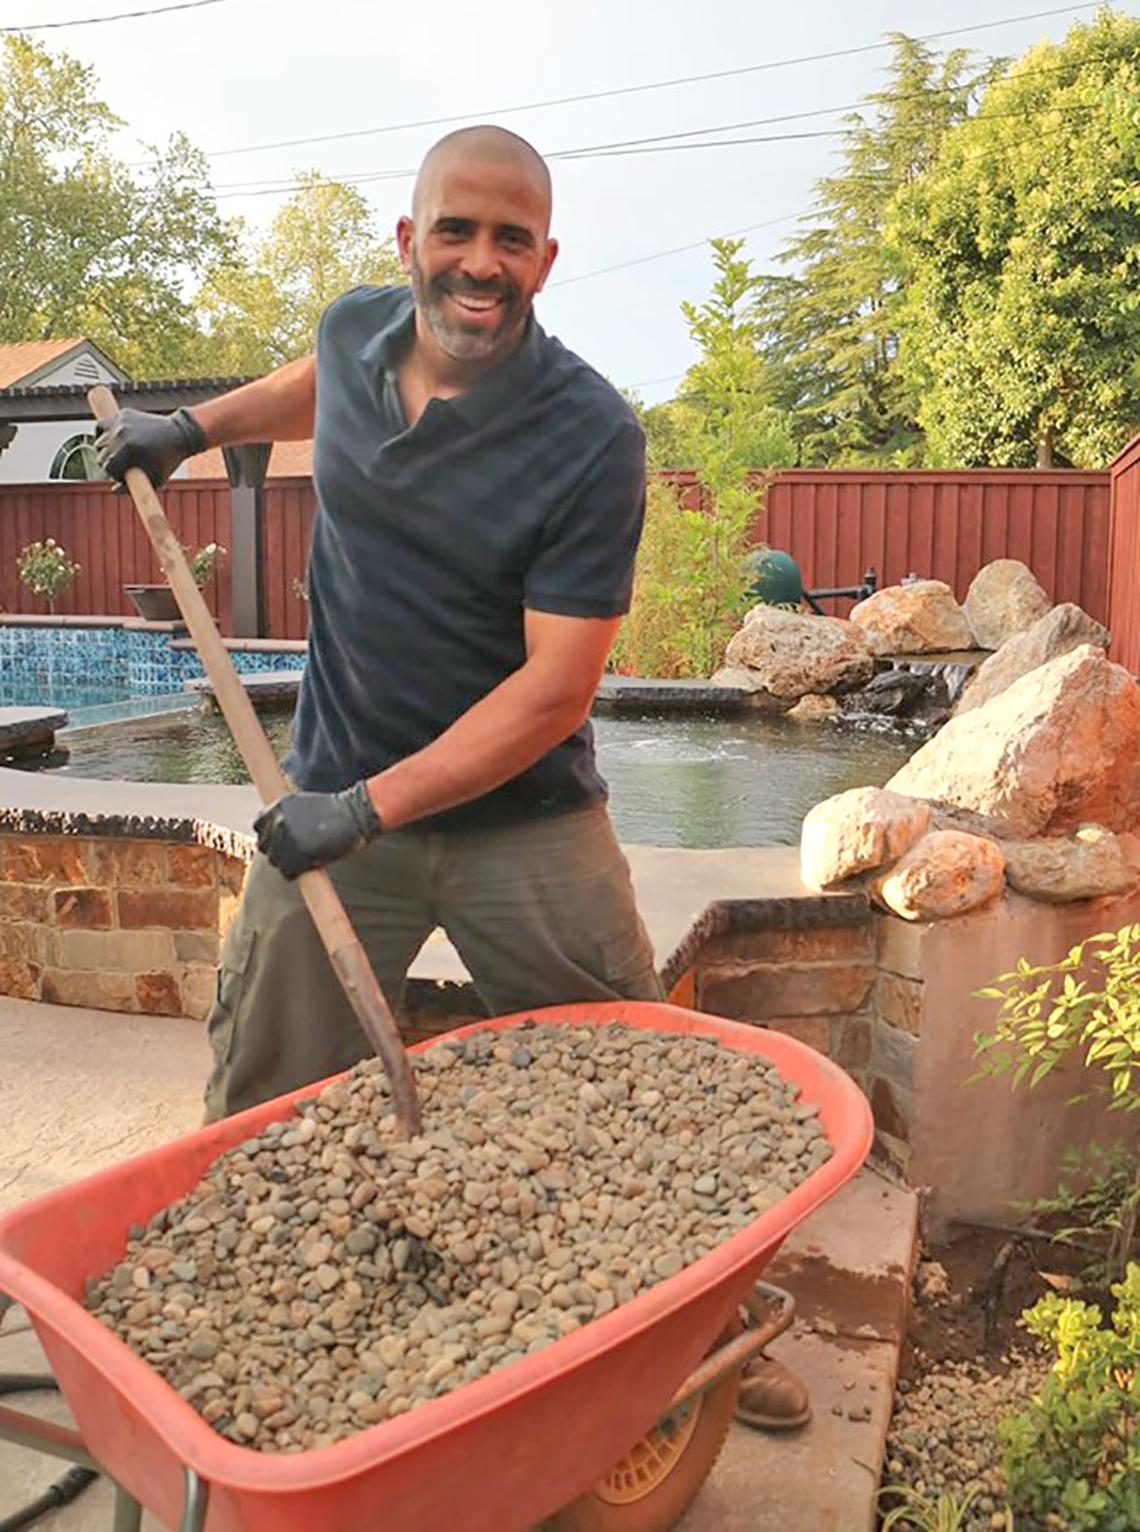 ahmed hassan landscape designer and host of yard crashers